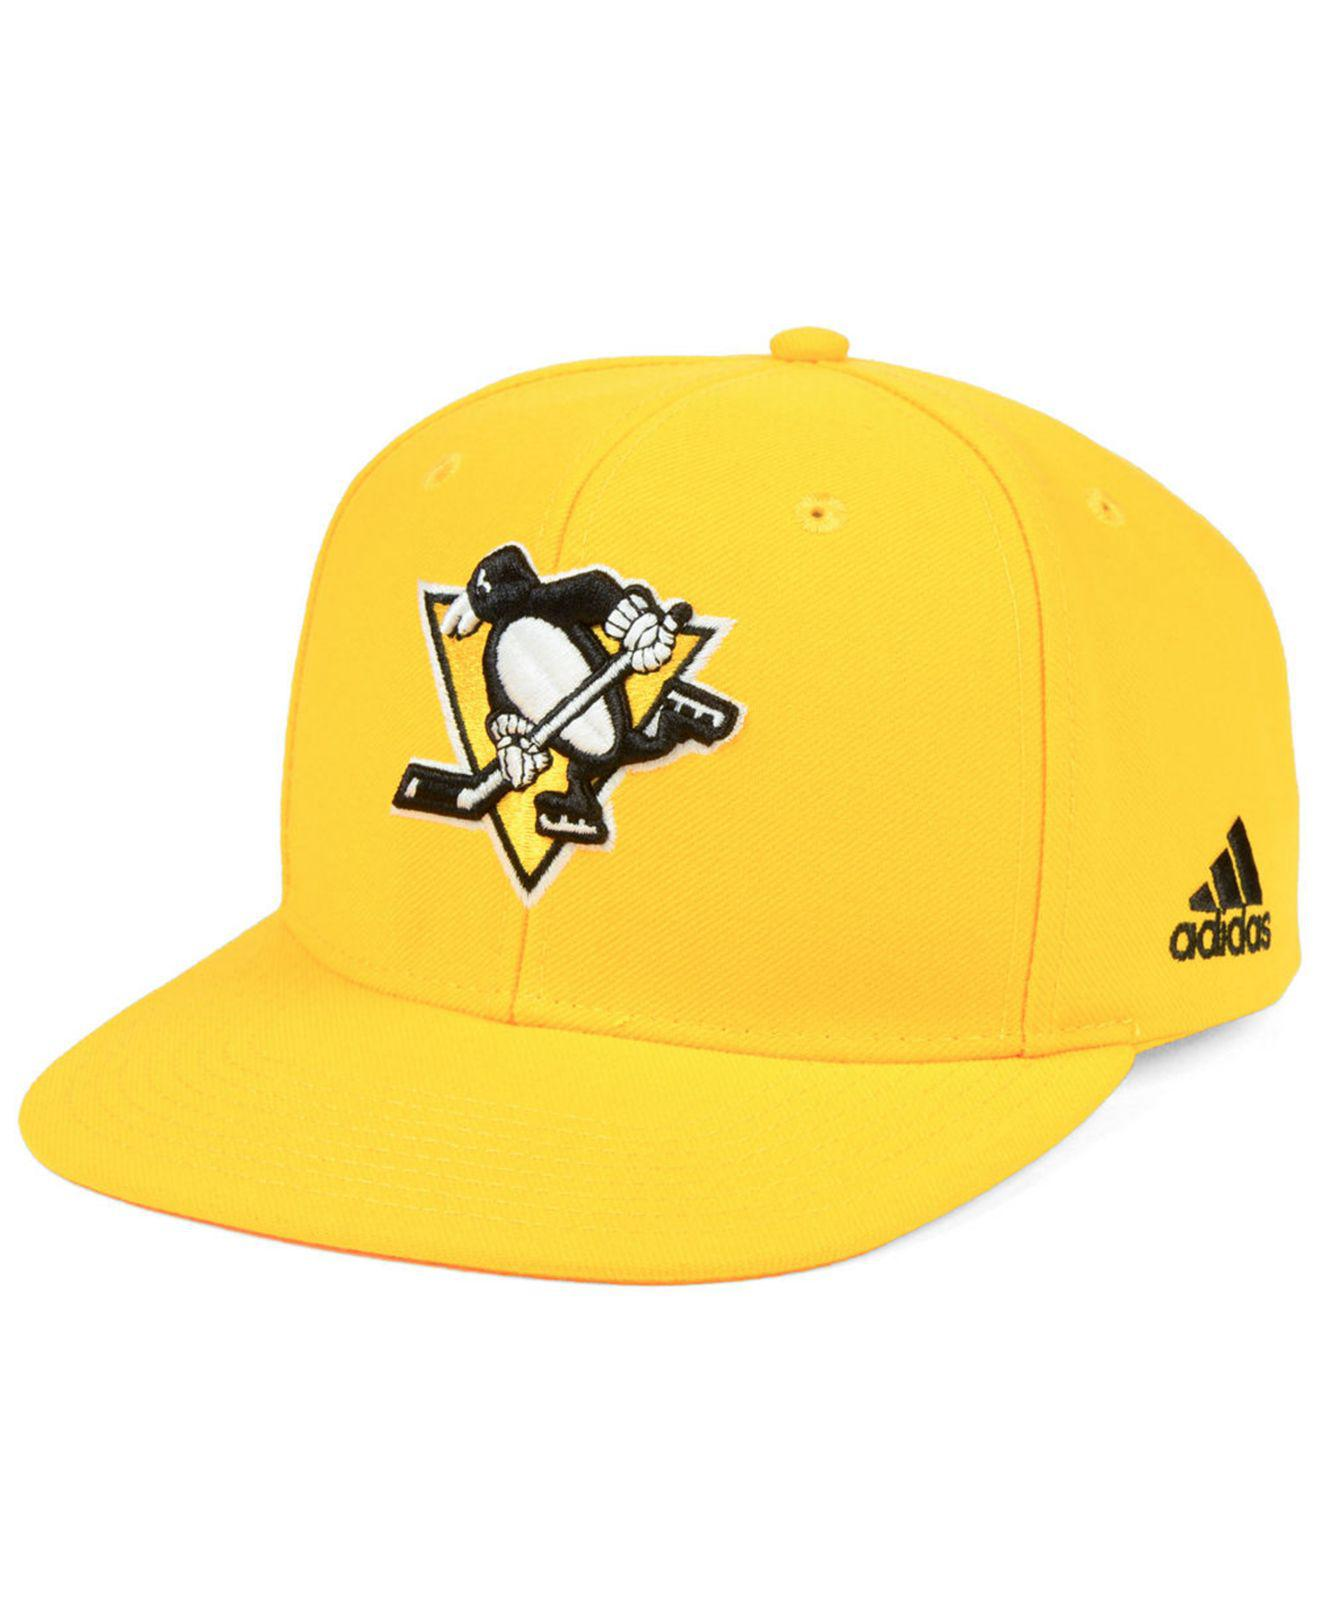 8869869e214 Adidas - Yellow Pittsburgh Penguins Core Snapback Cap for Men - Lyst. View  fullscreen